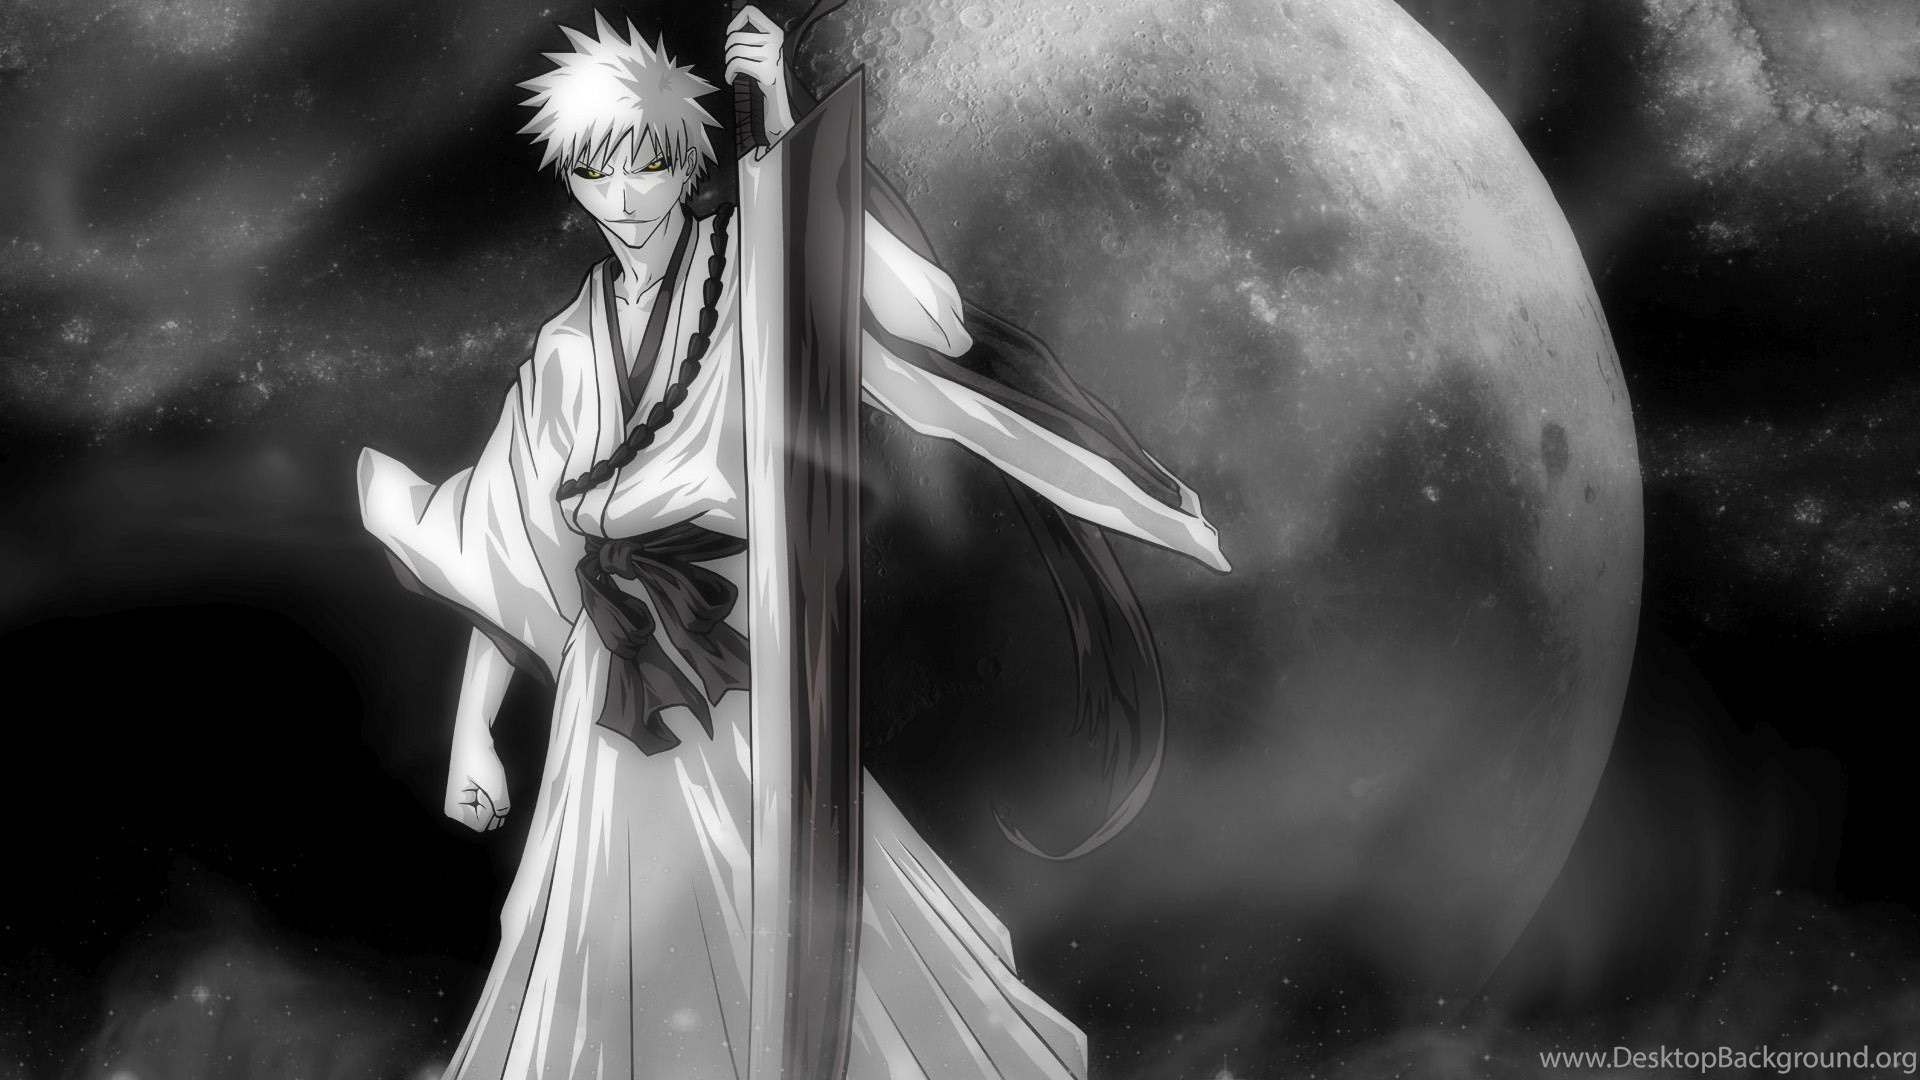 Hollow Ichigo Bleach Wallpapers Desktop Background